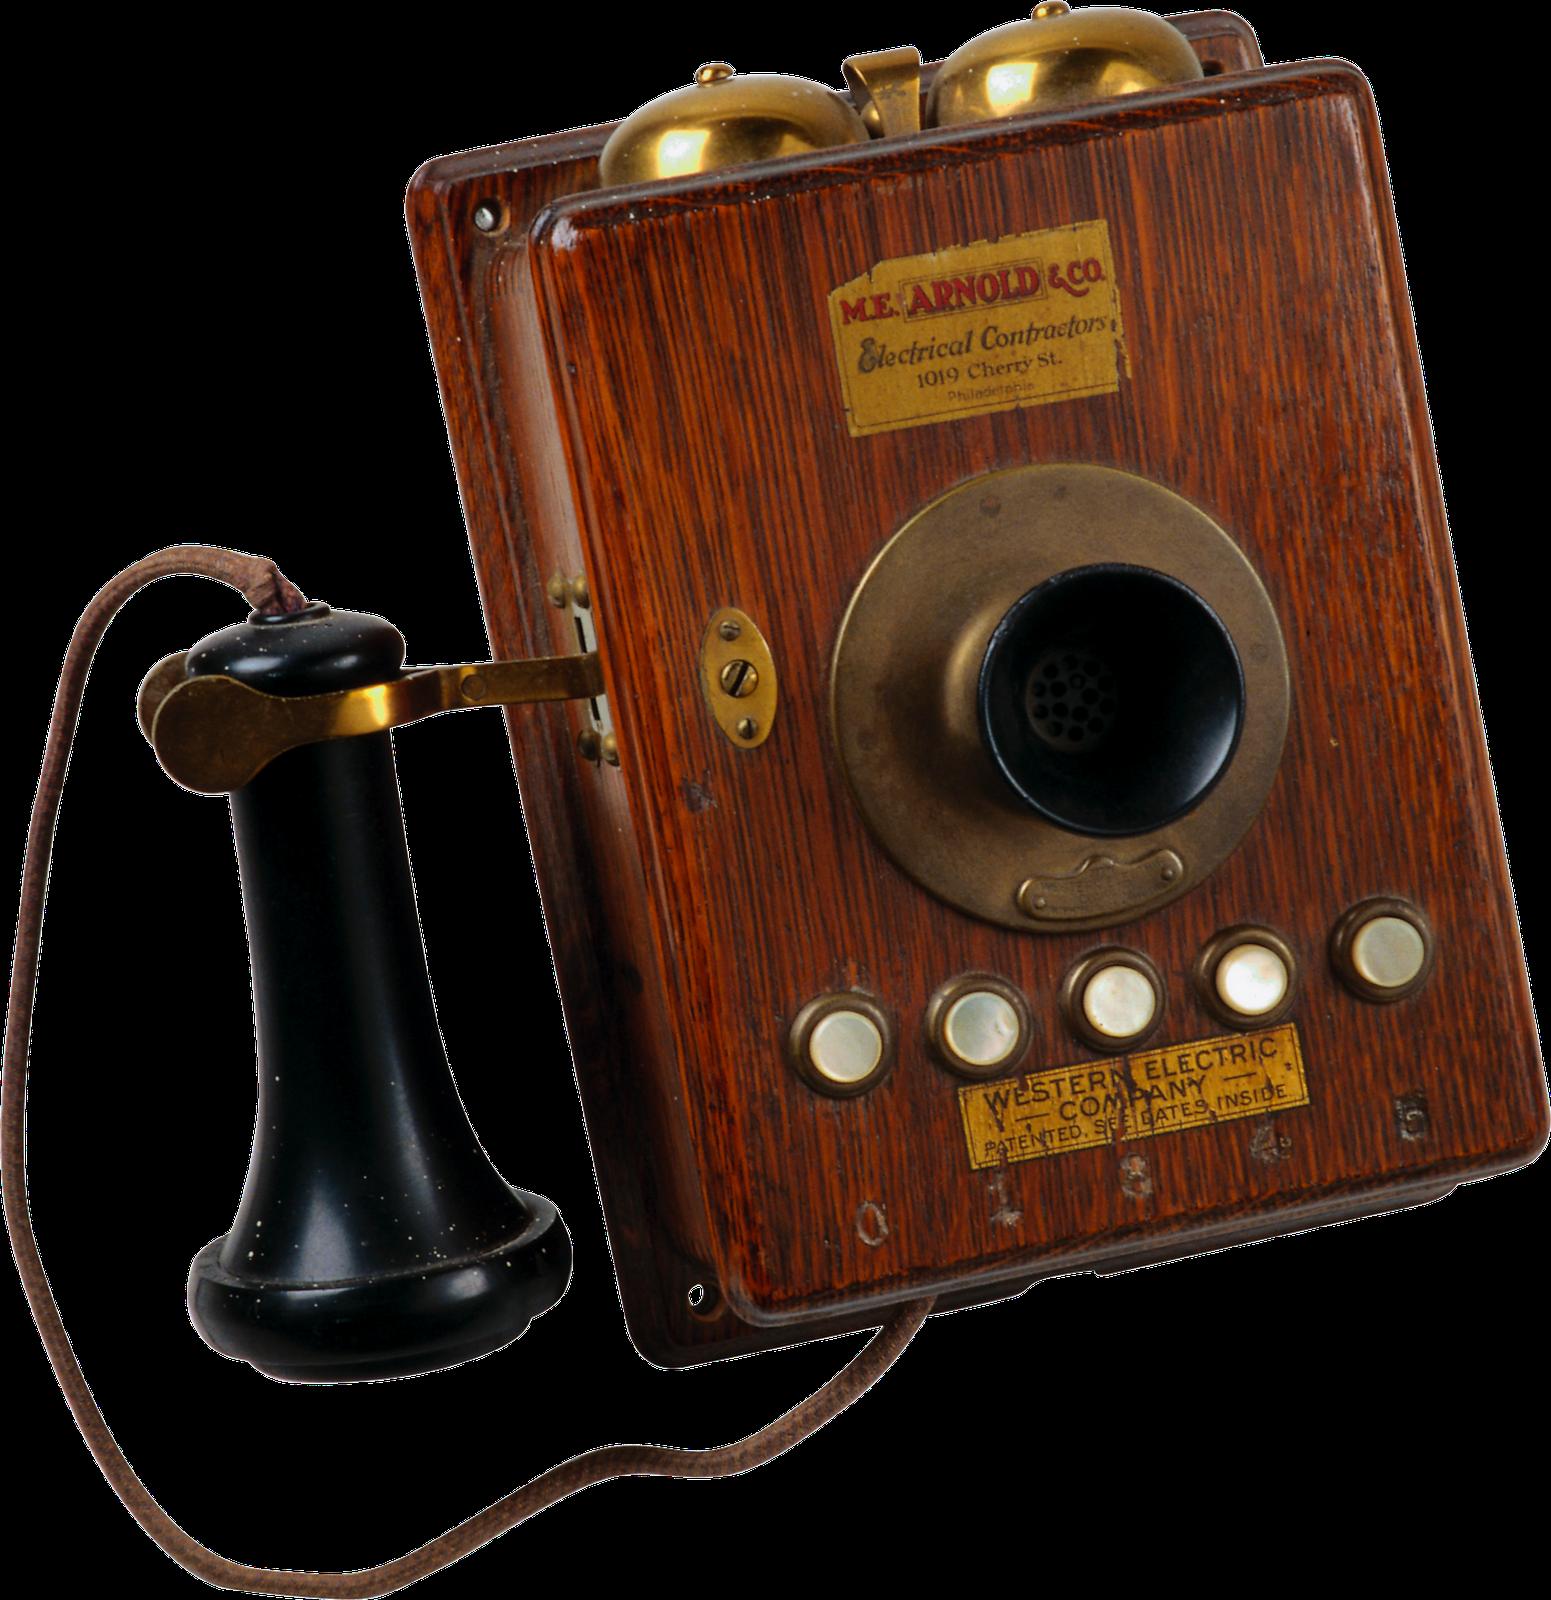 Alexander Graham Telefon Flugzeug Rotory Vintage